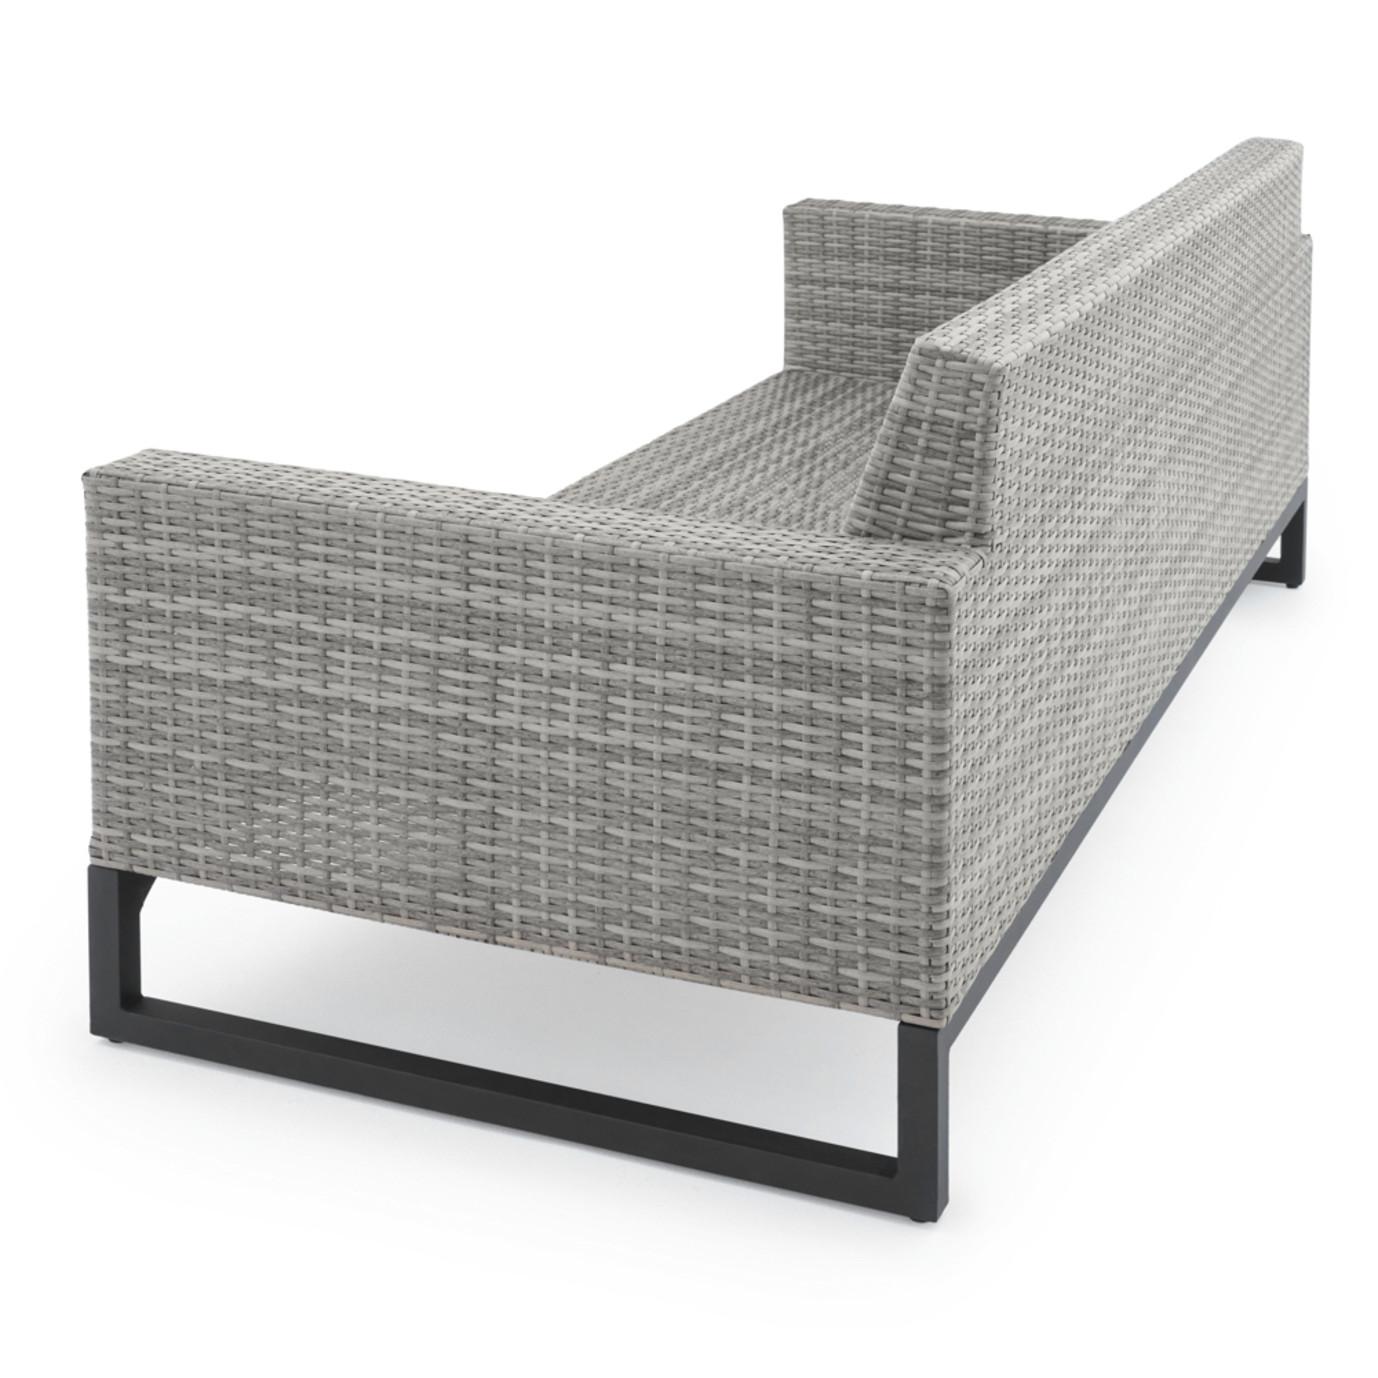 Milo™ Grey 7pc Motion Deep Seating Set - Sunset Red